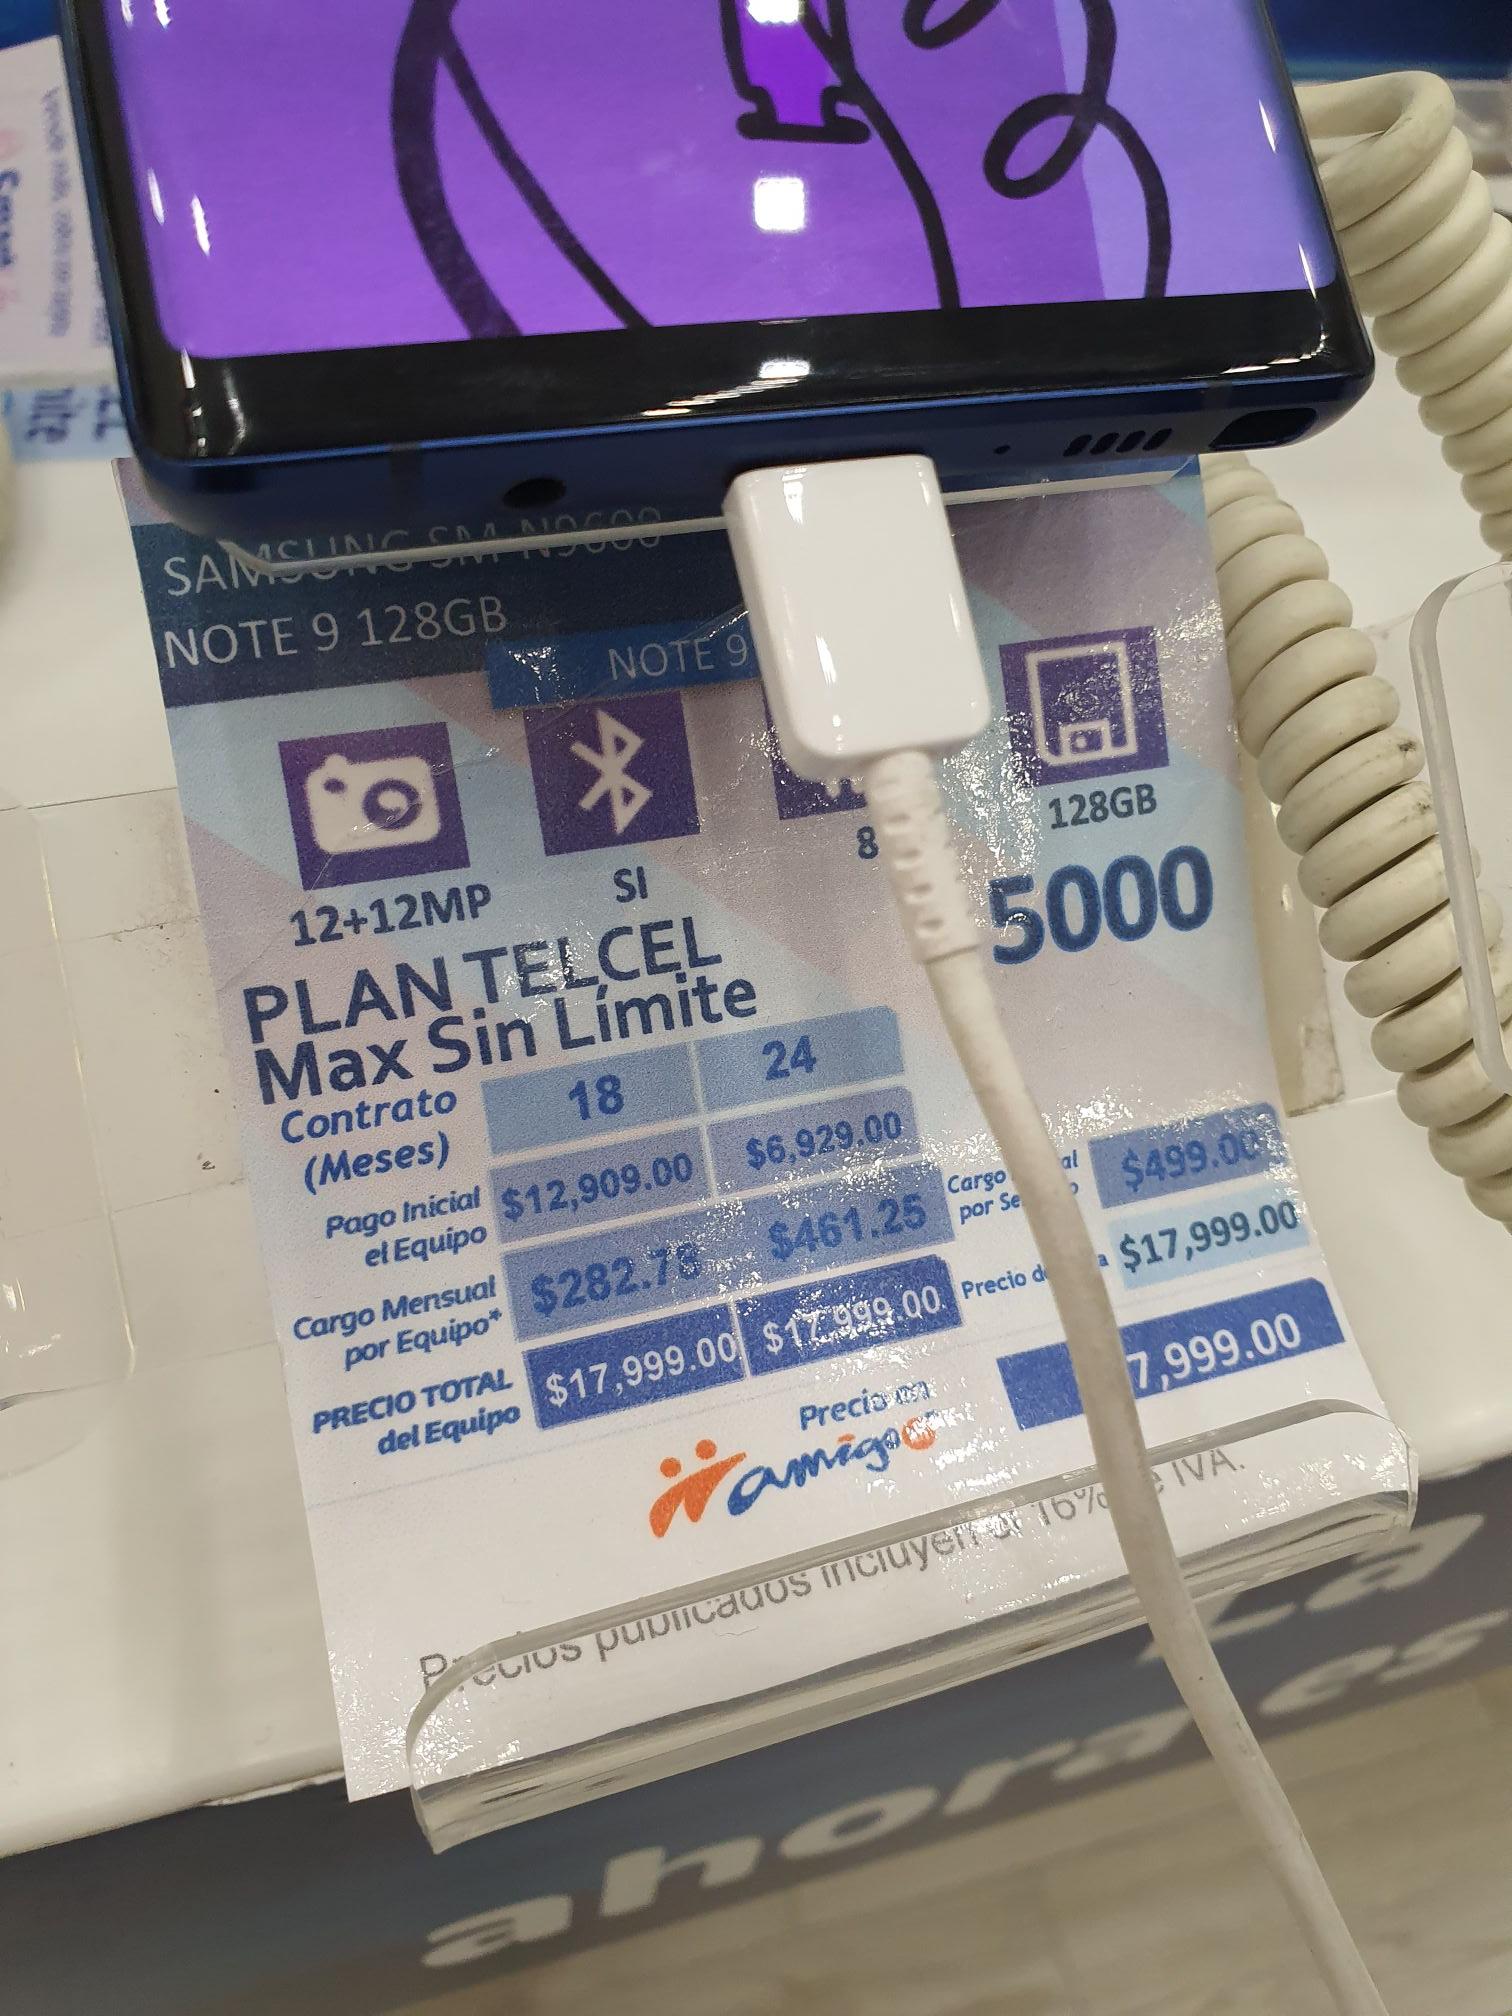 CAC Telcel: Samsung Galaxy Note 9 en plan Telcel Max Sin Límites 5000 plazo forzoso 24 meses